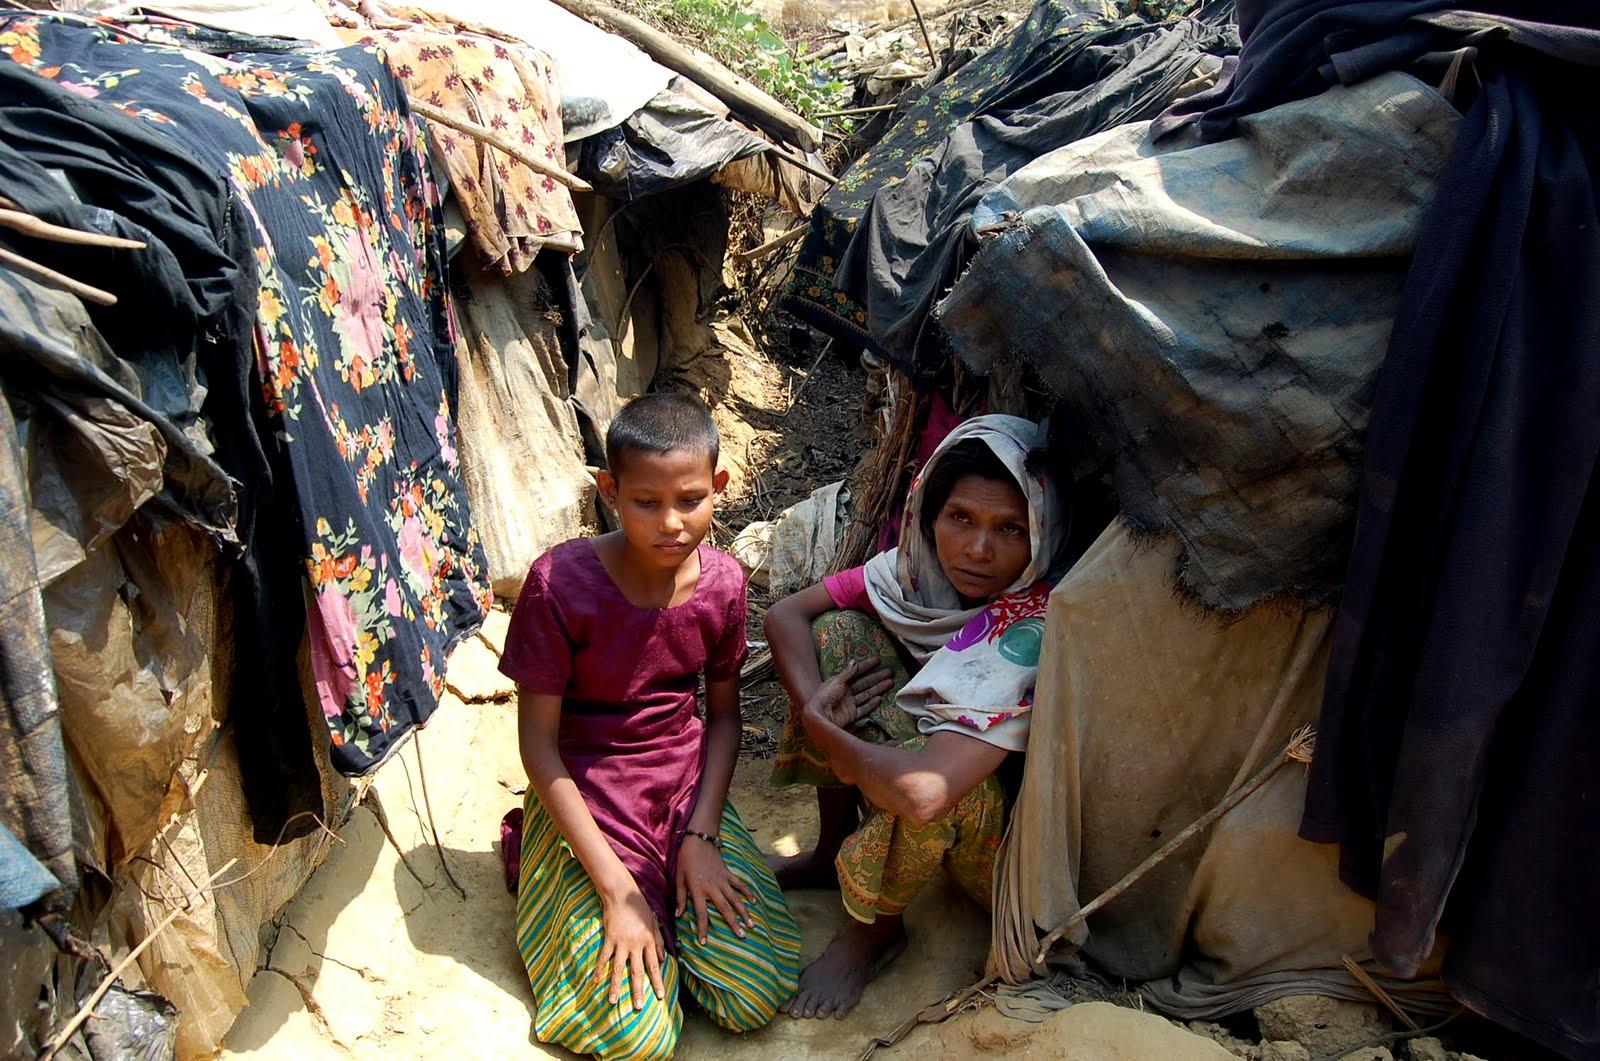 Rohingya people